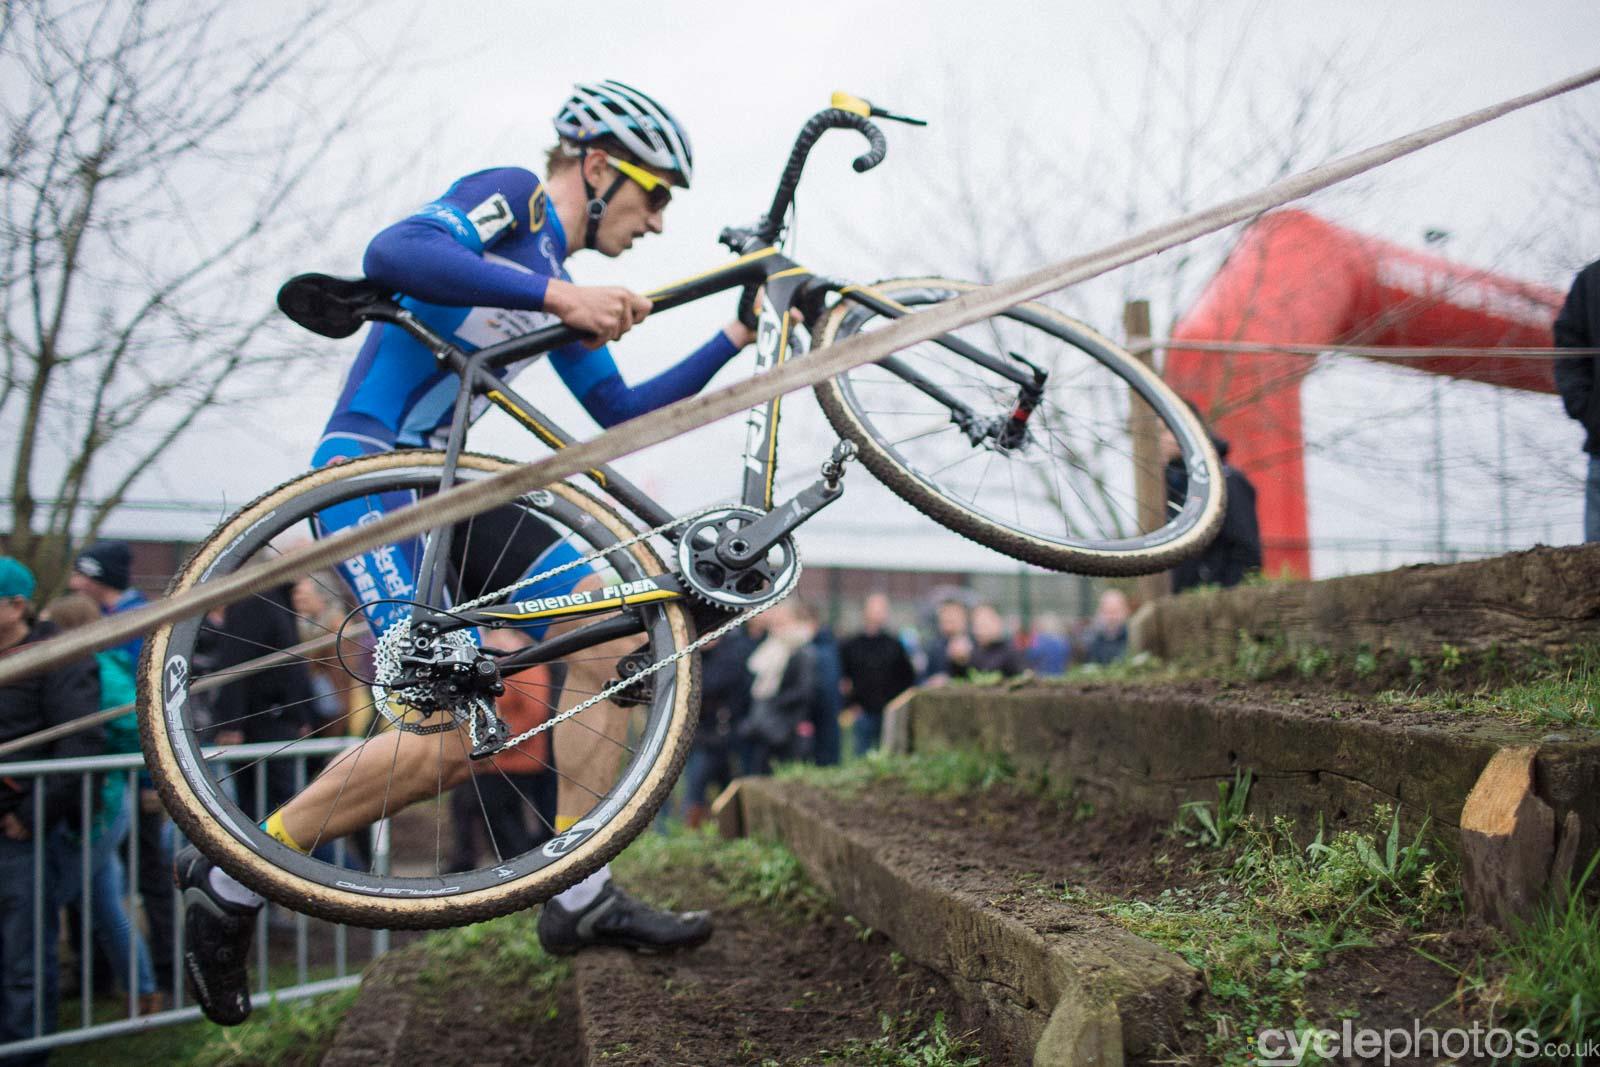 2015-cyclephotos-cyclocross-azencross-123247-quinten-hermans